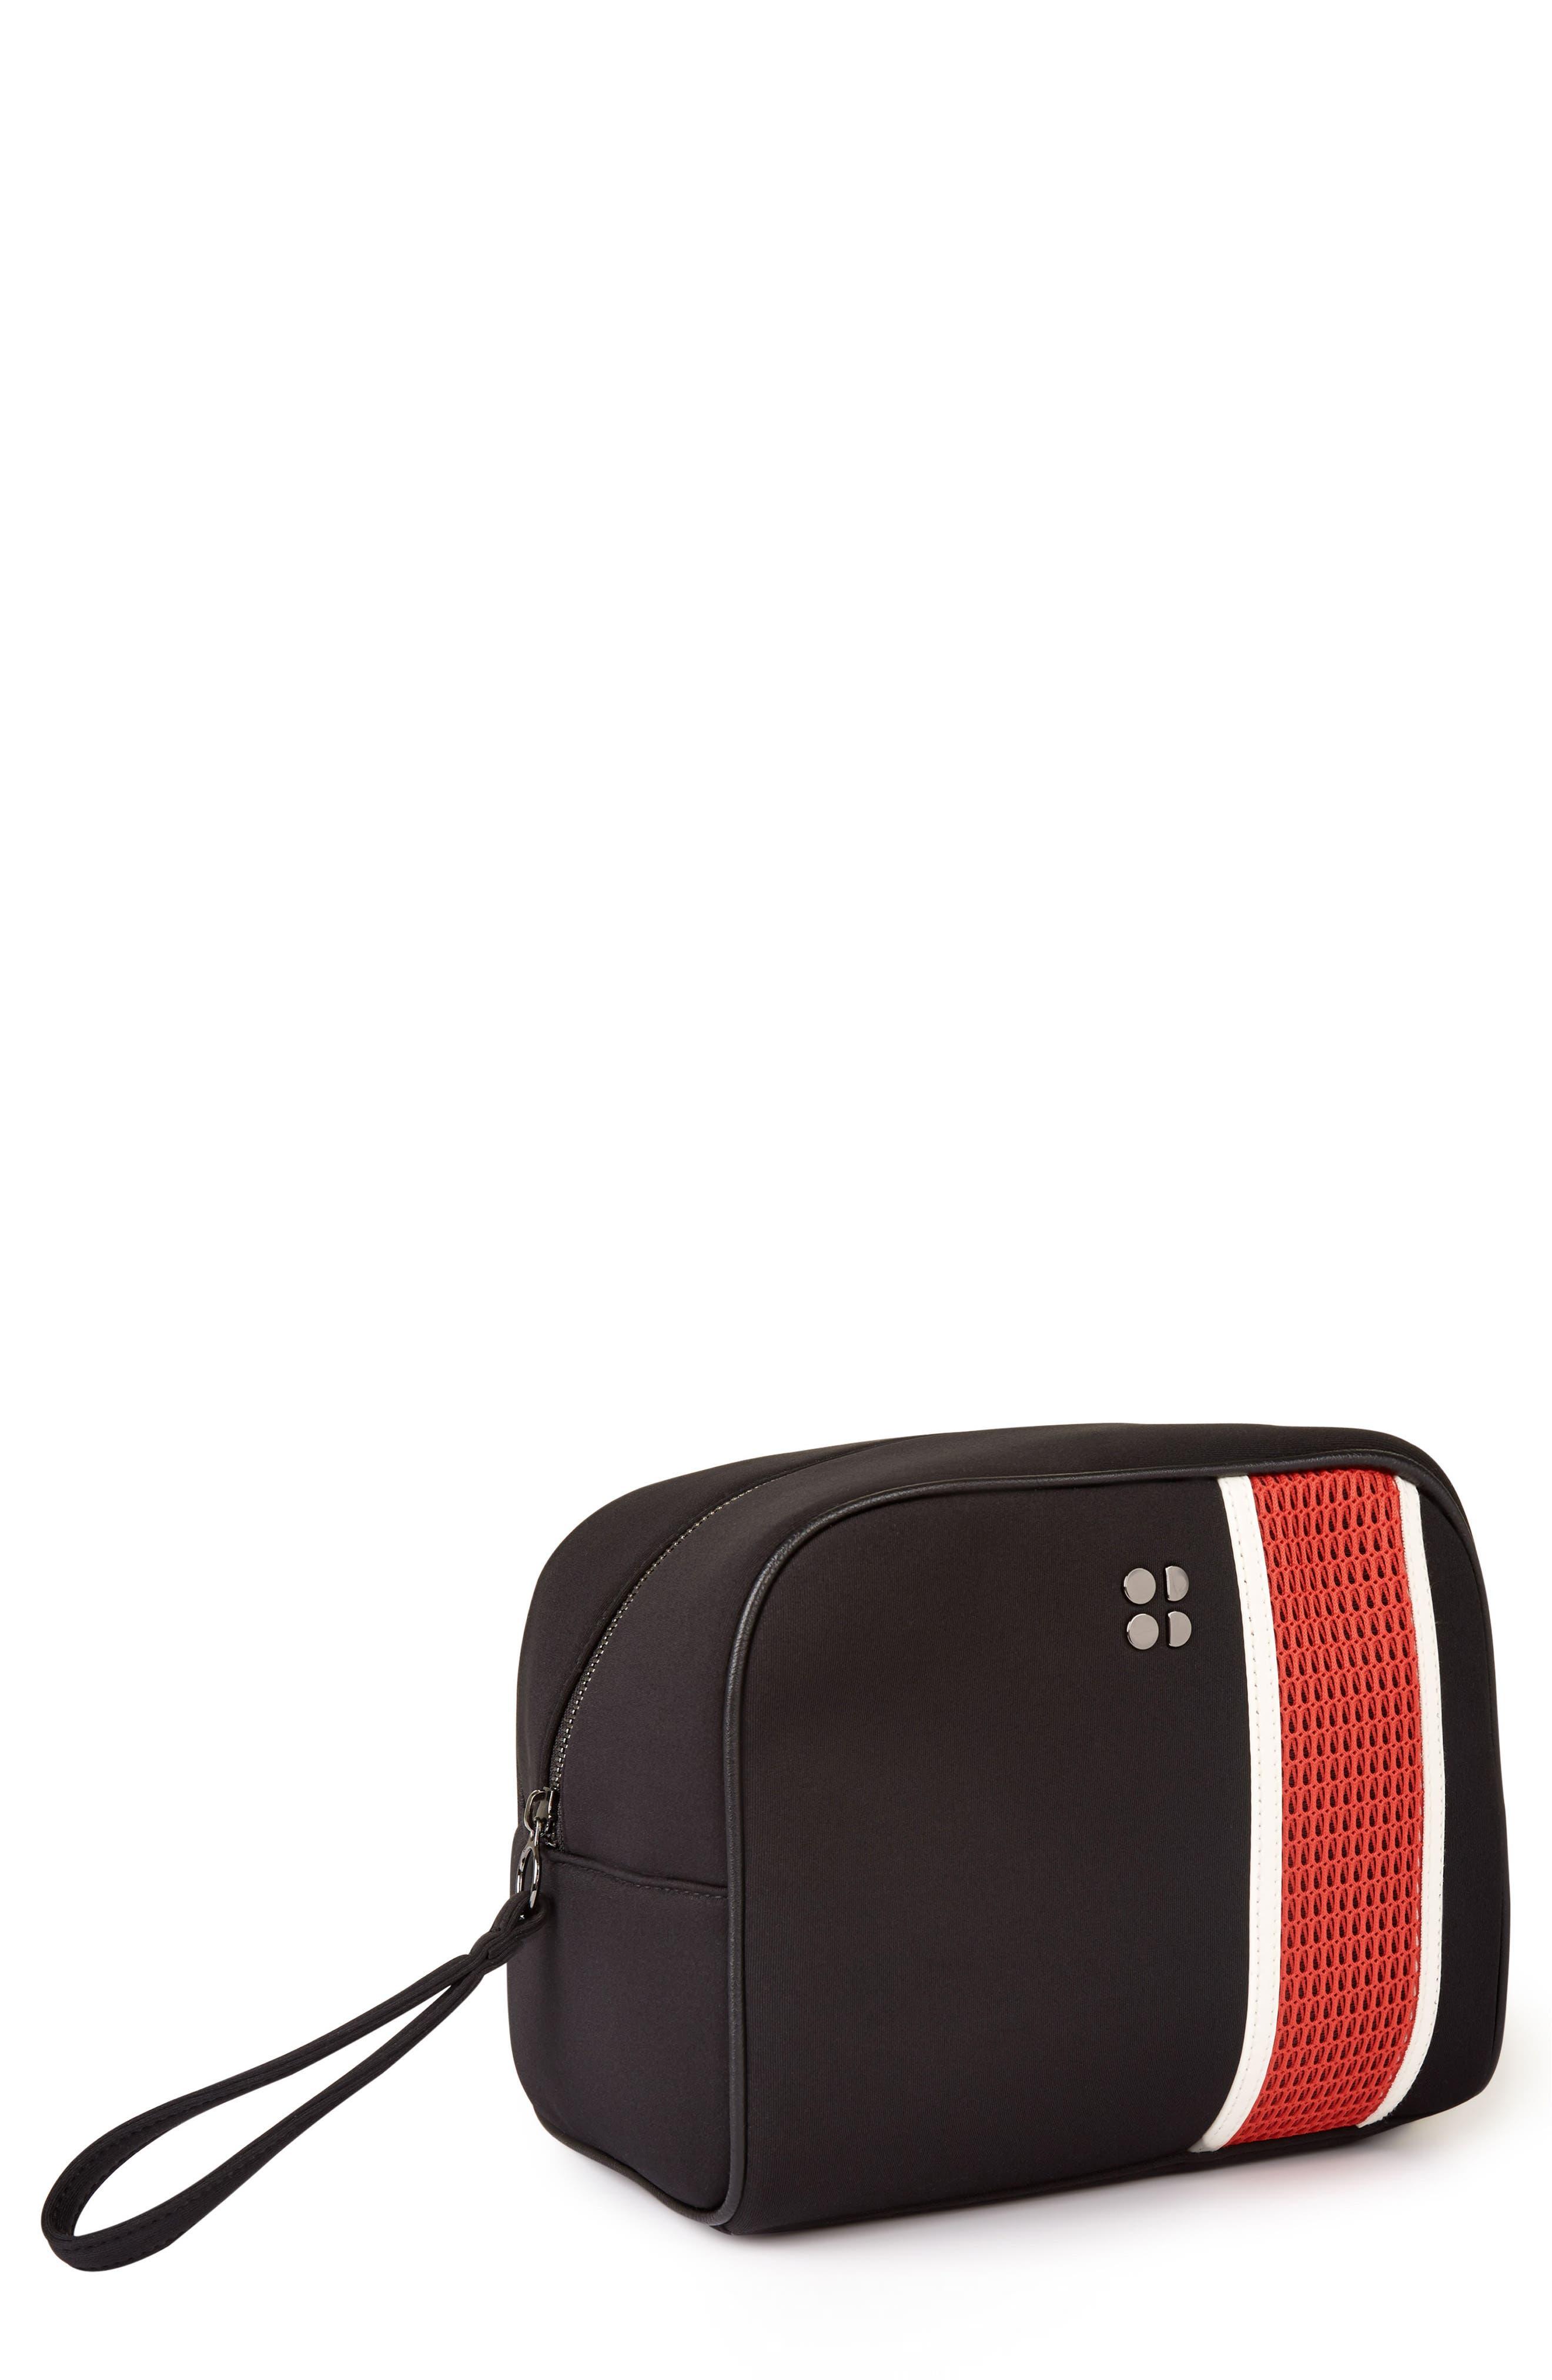 Wash Bag,                         Main,                         color, Black